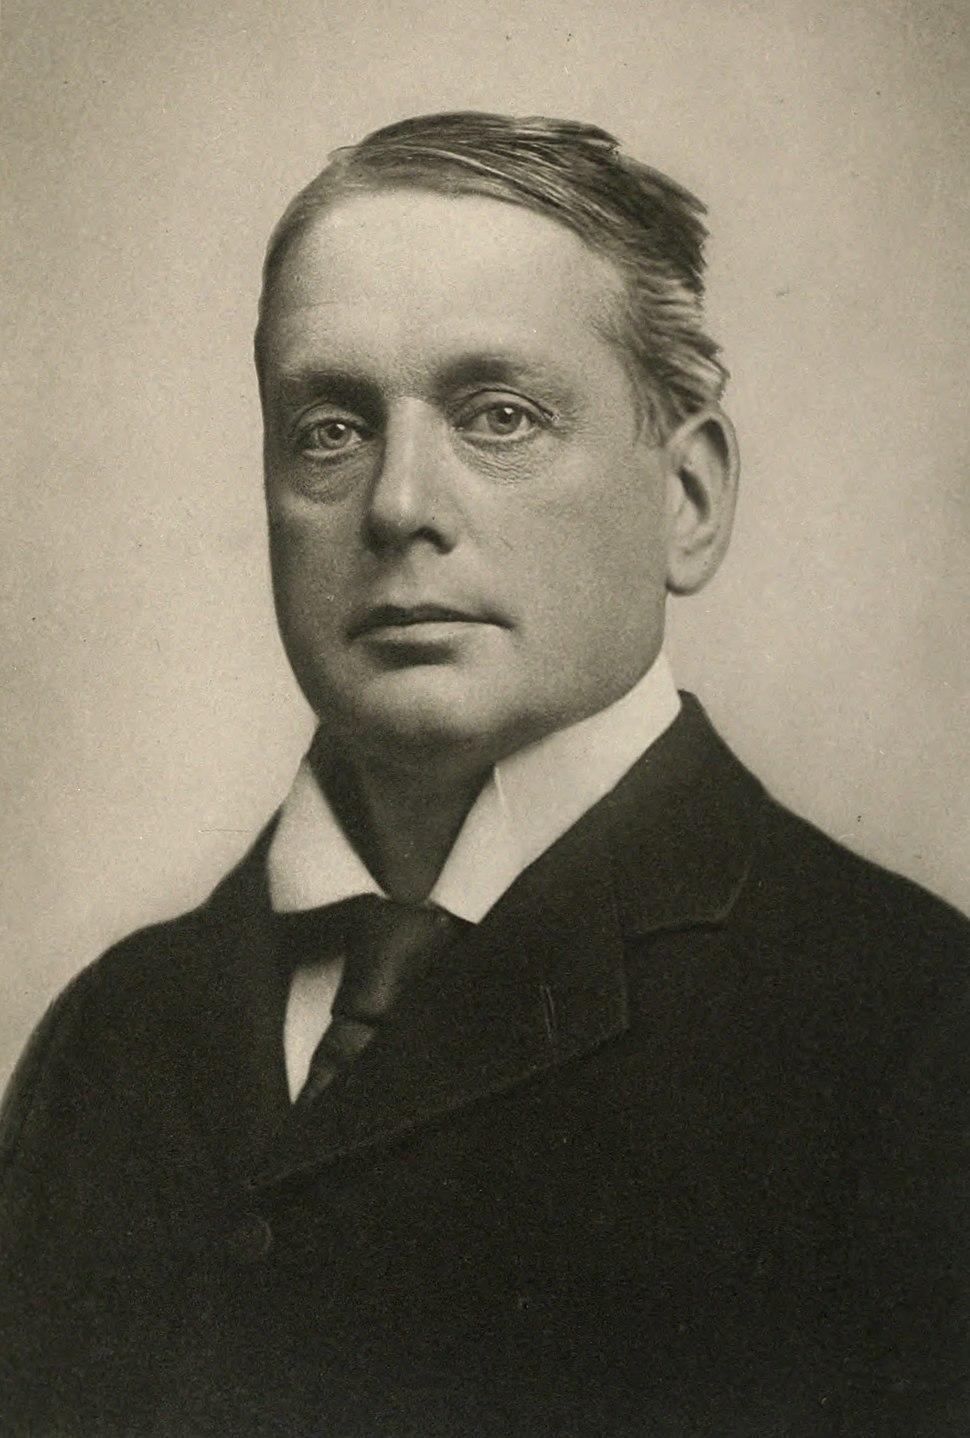 The Earl of Rosebery